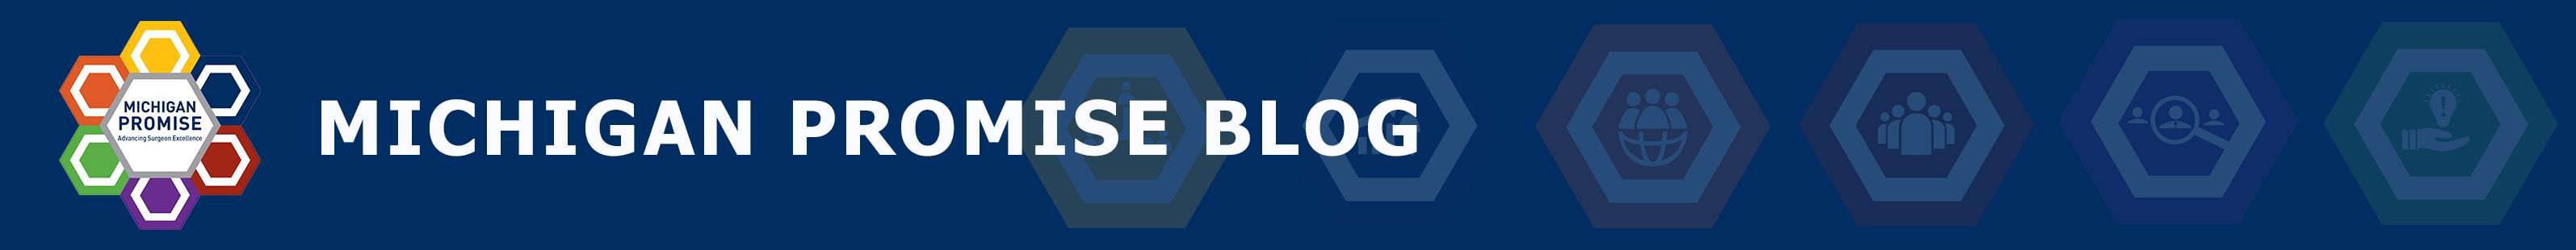 Michigan Promise Blog Heading